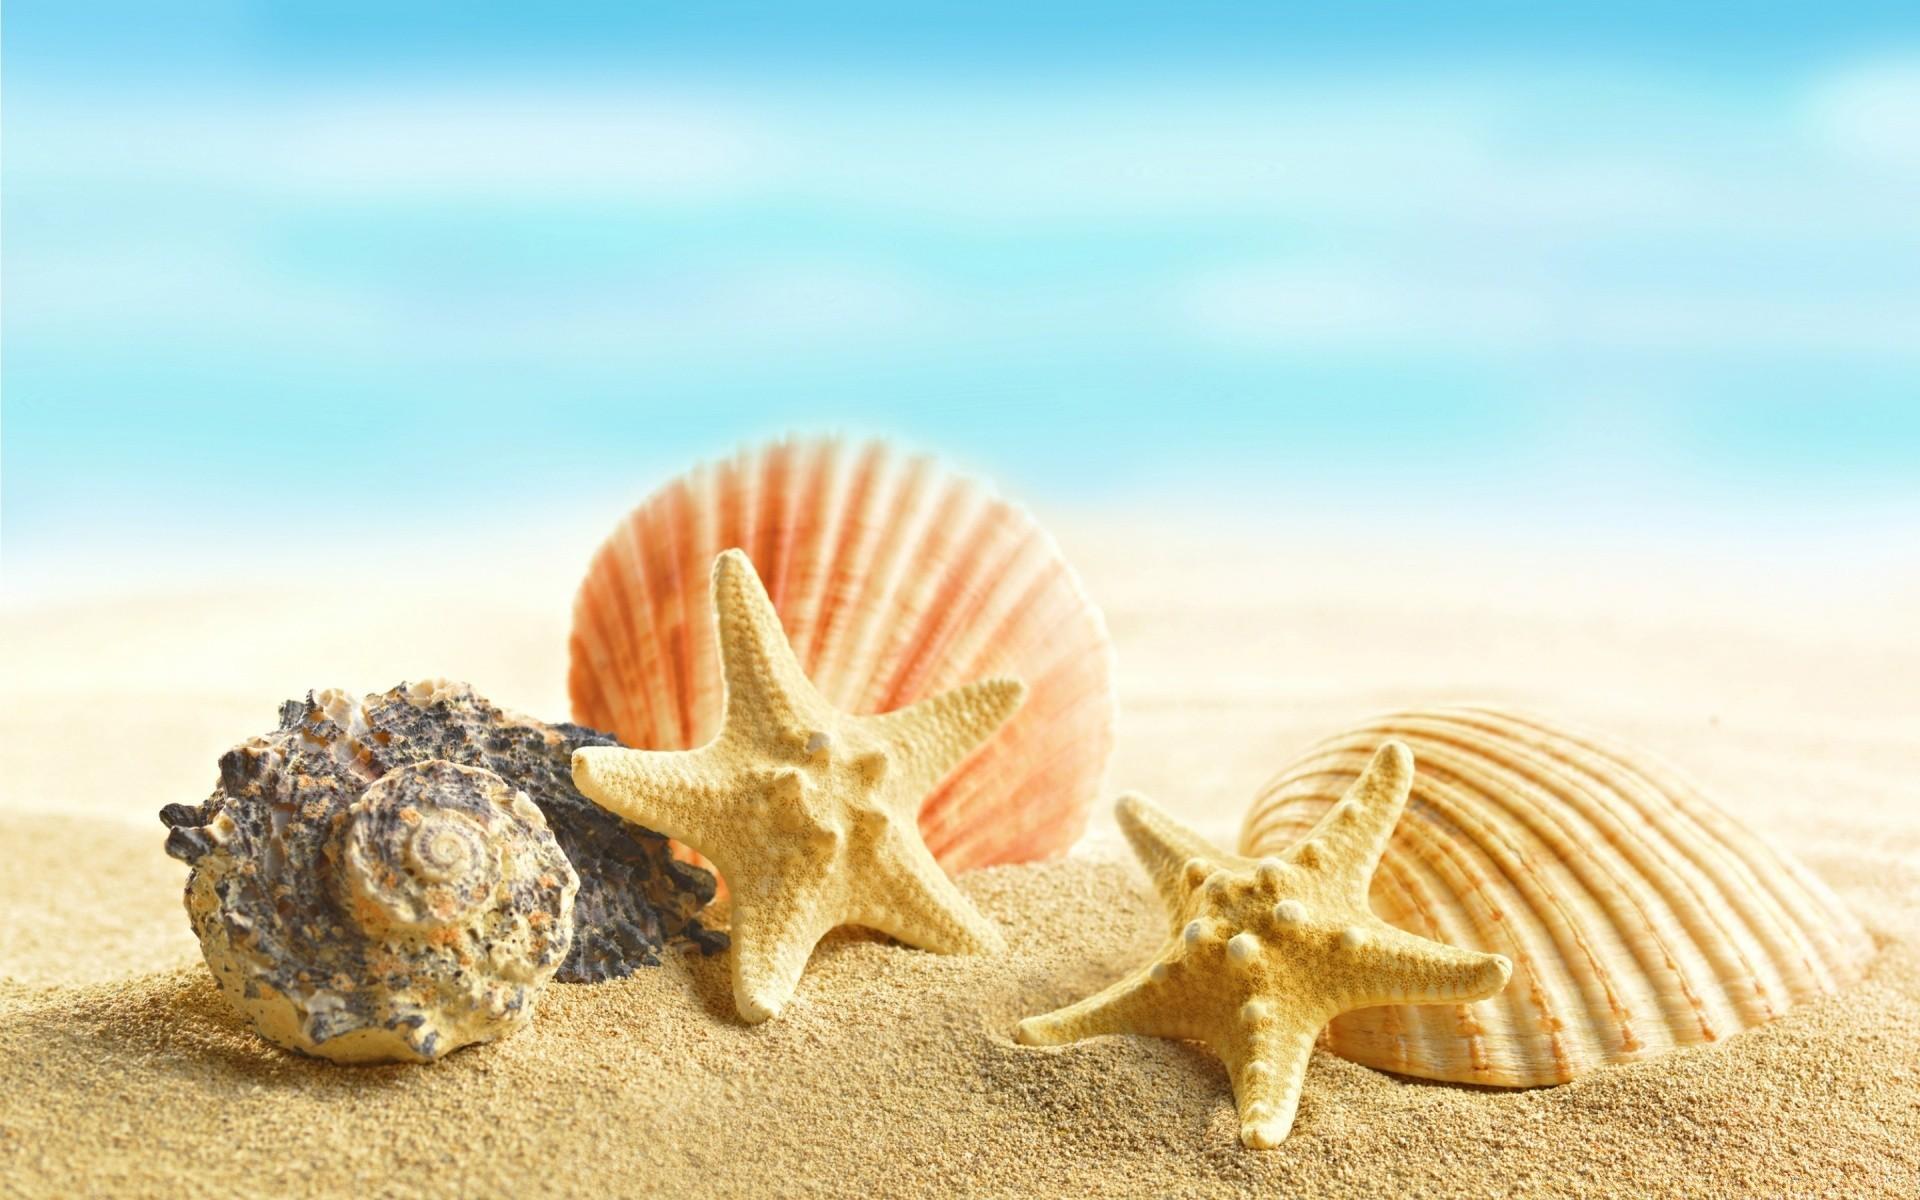 Картинки ракушки на песке, открытка летием